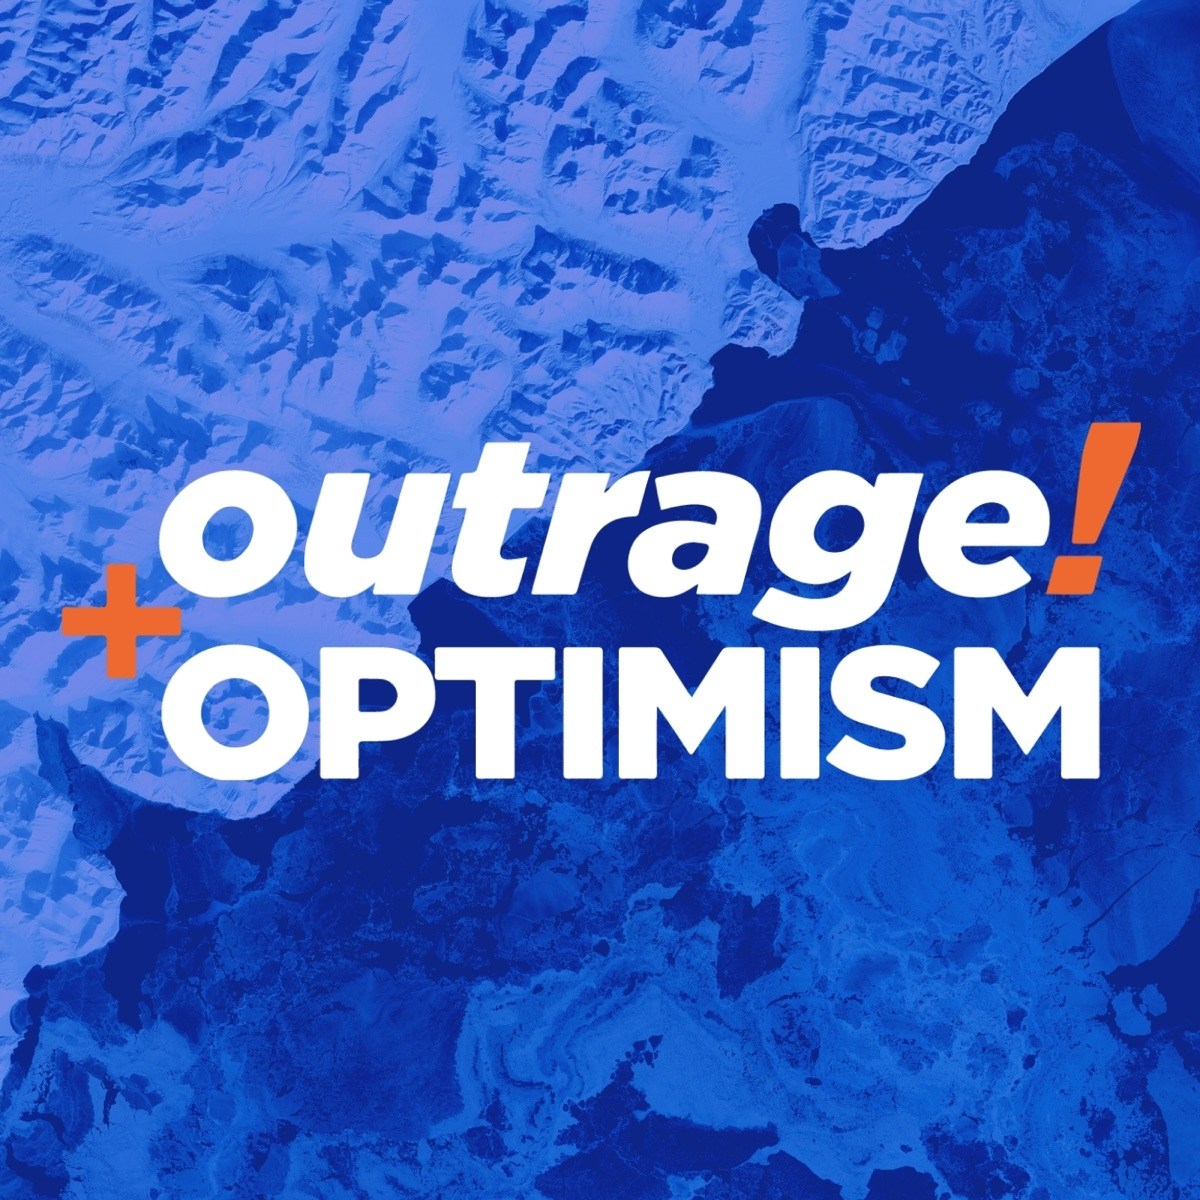 Outrage + Optimism